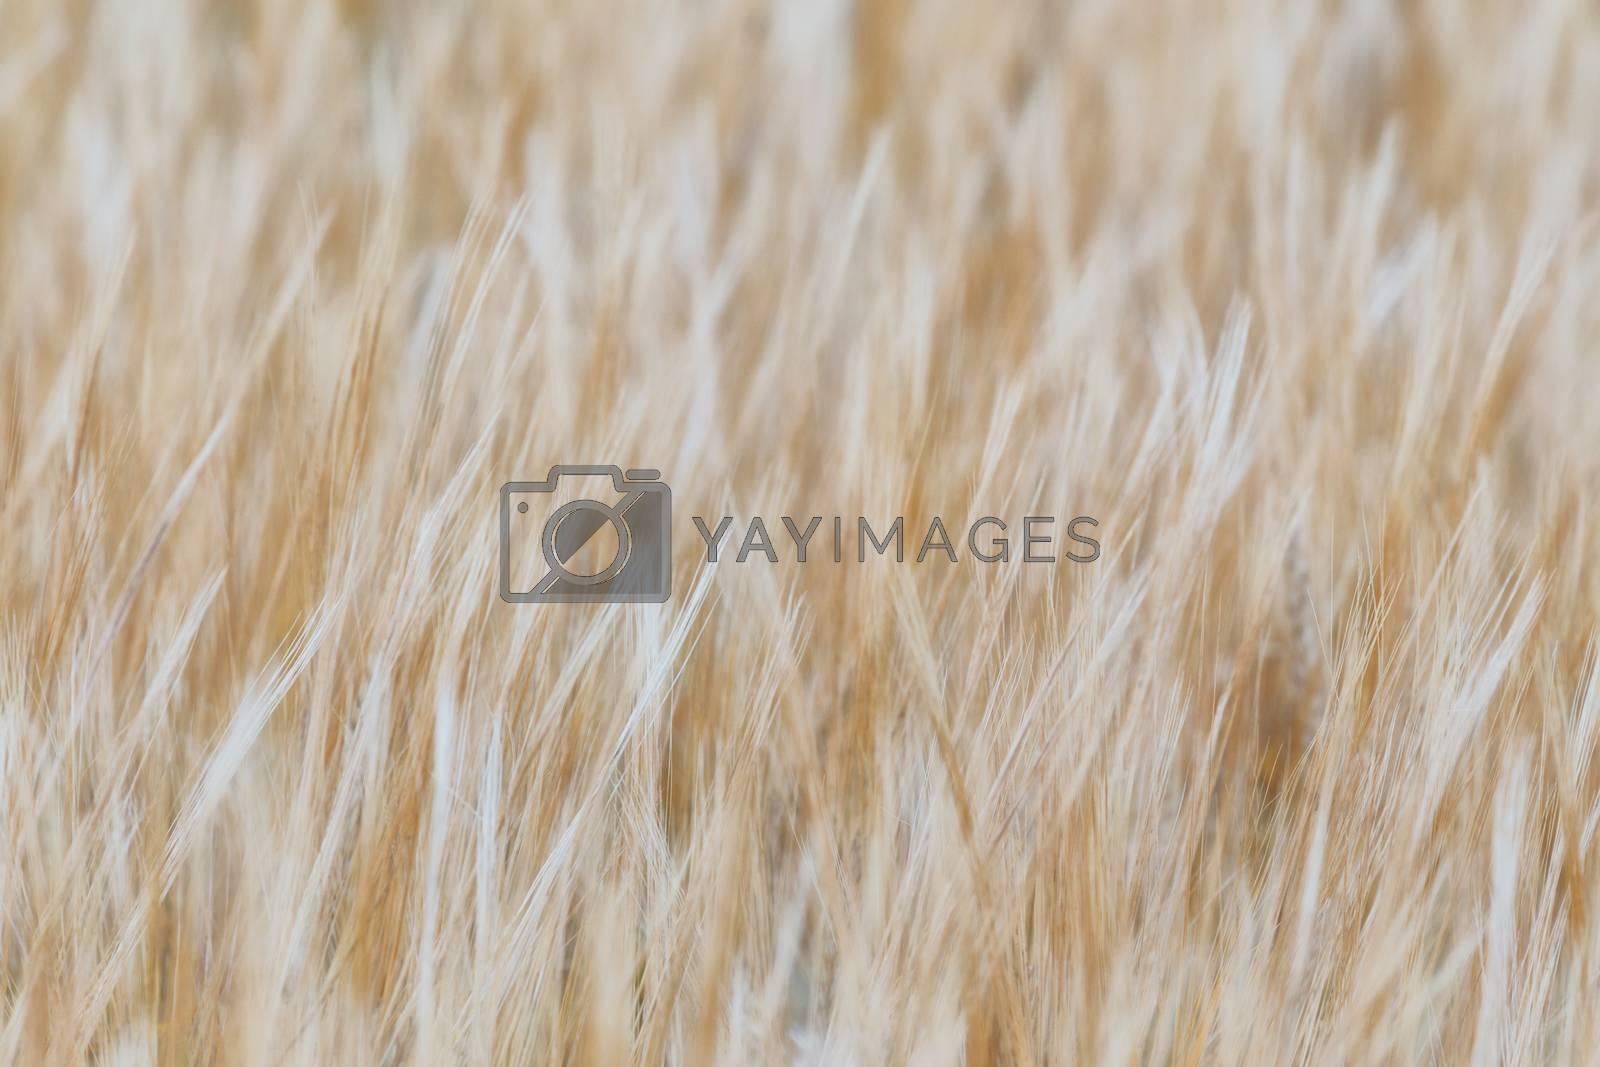 Barley texture by aruizhu